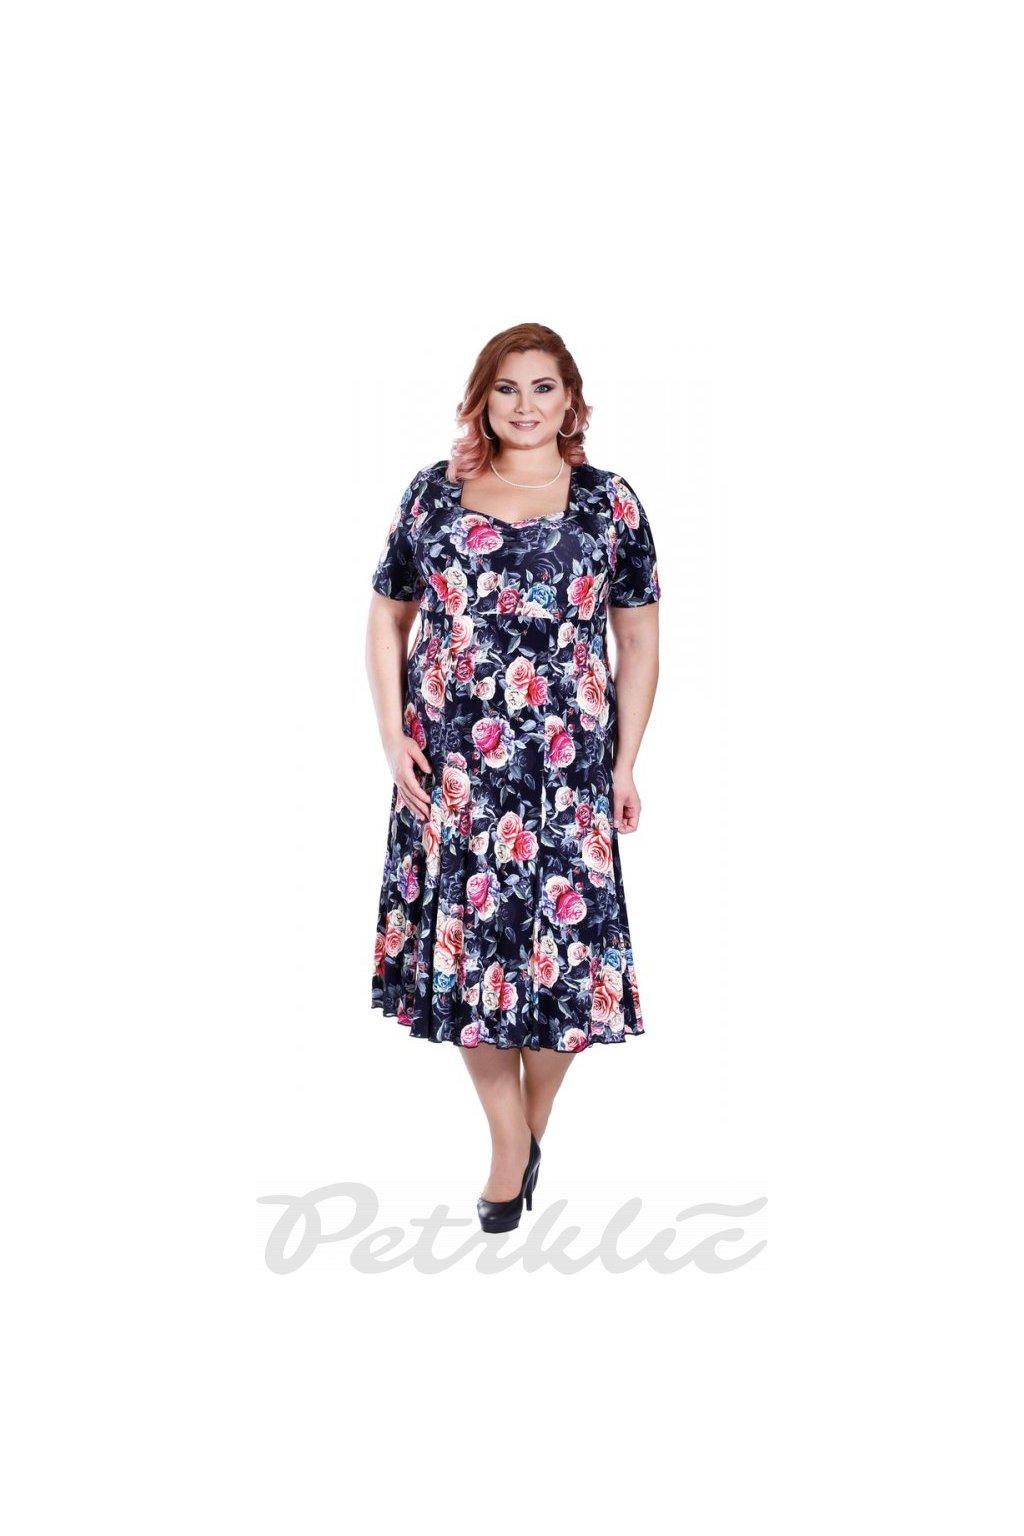 VANDUŠA - šaty 100 - 105 cm